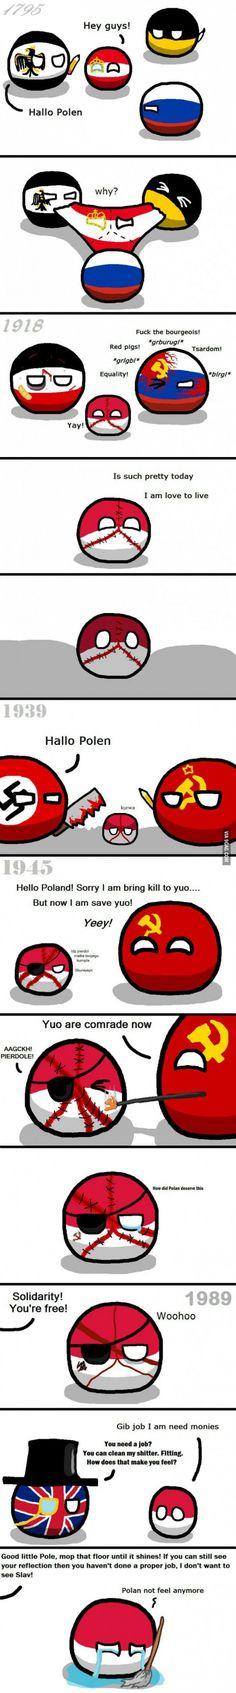 But don't cry when you're mobbing. Best Funny Pictures, Funny Images, Austrian Empire, History Jokes, Funny Comics, Sad Comics, Hetalia, Dankest Memes, Hilarious